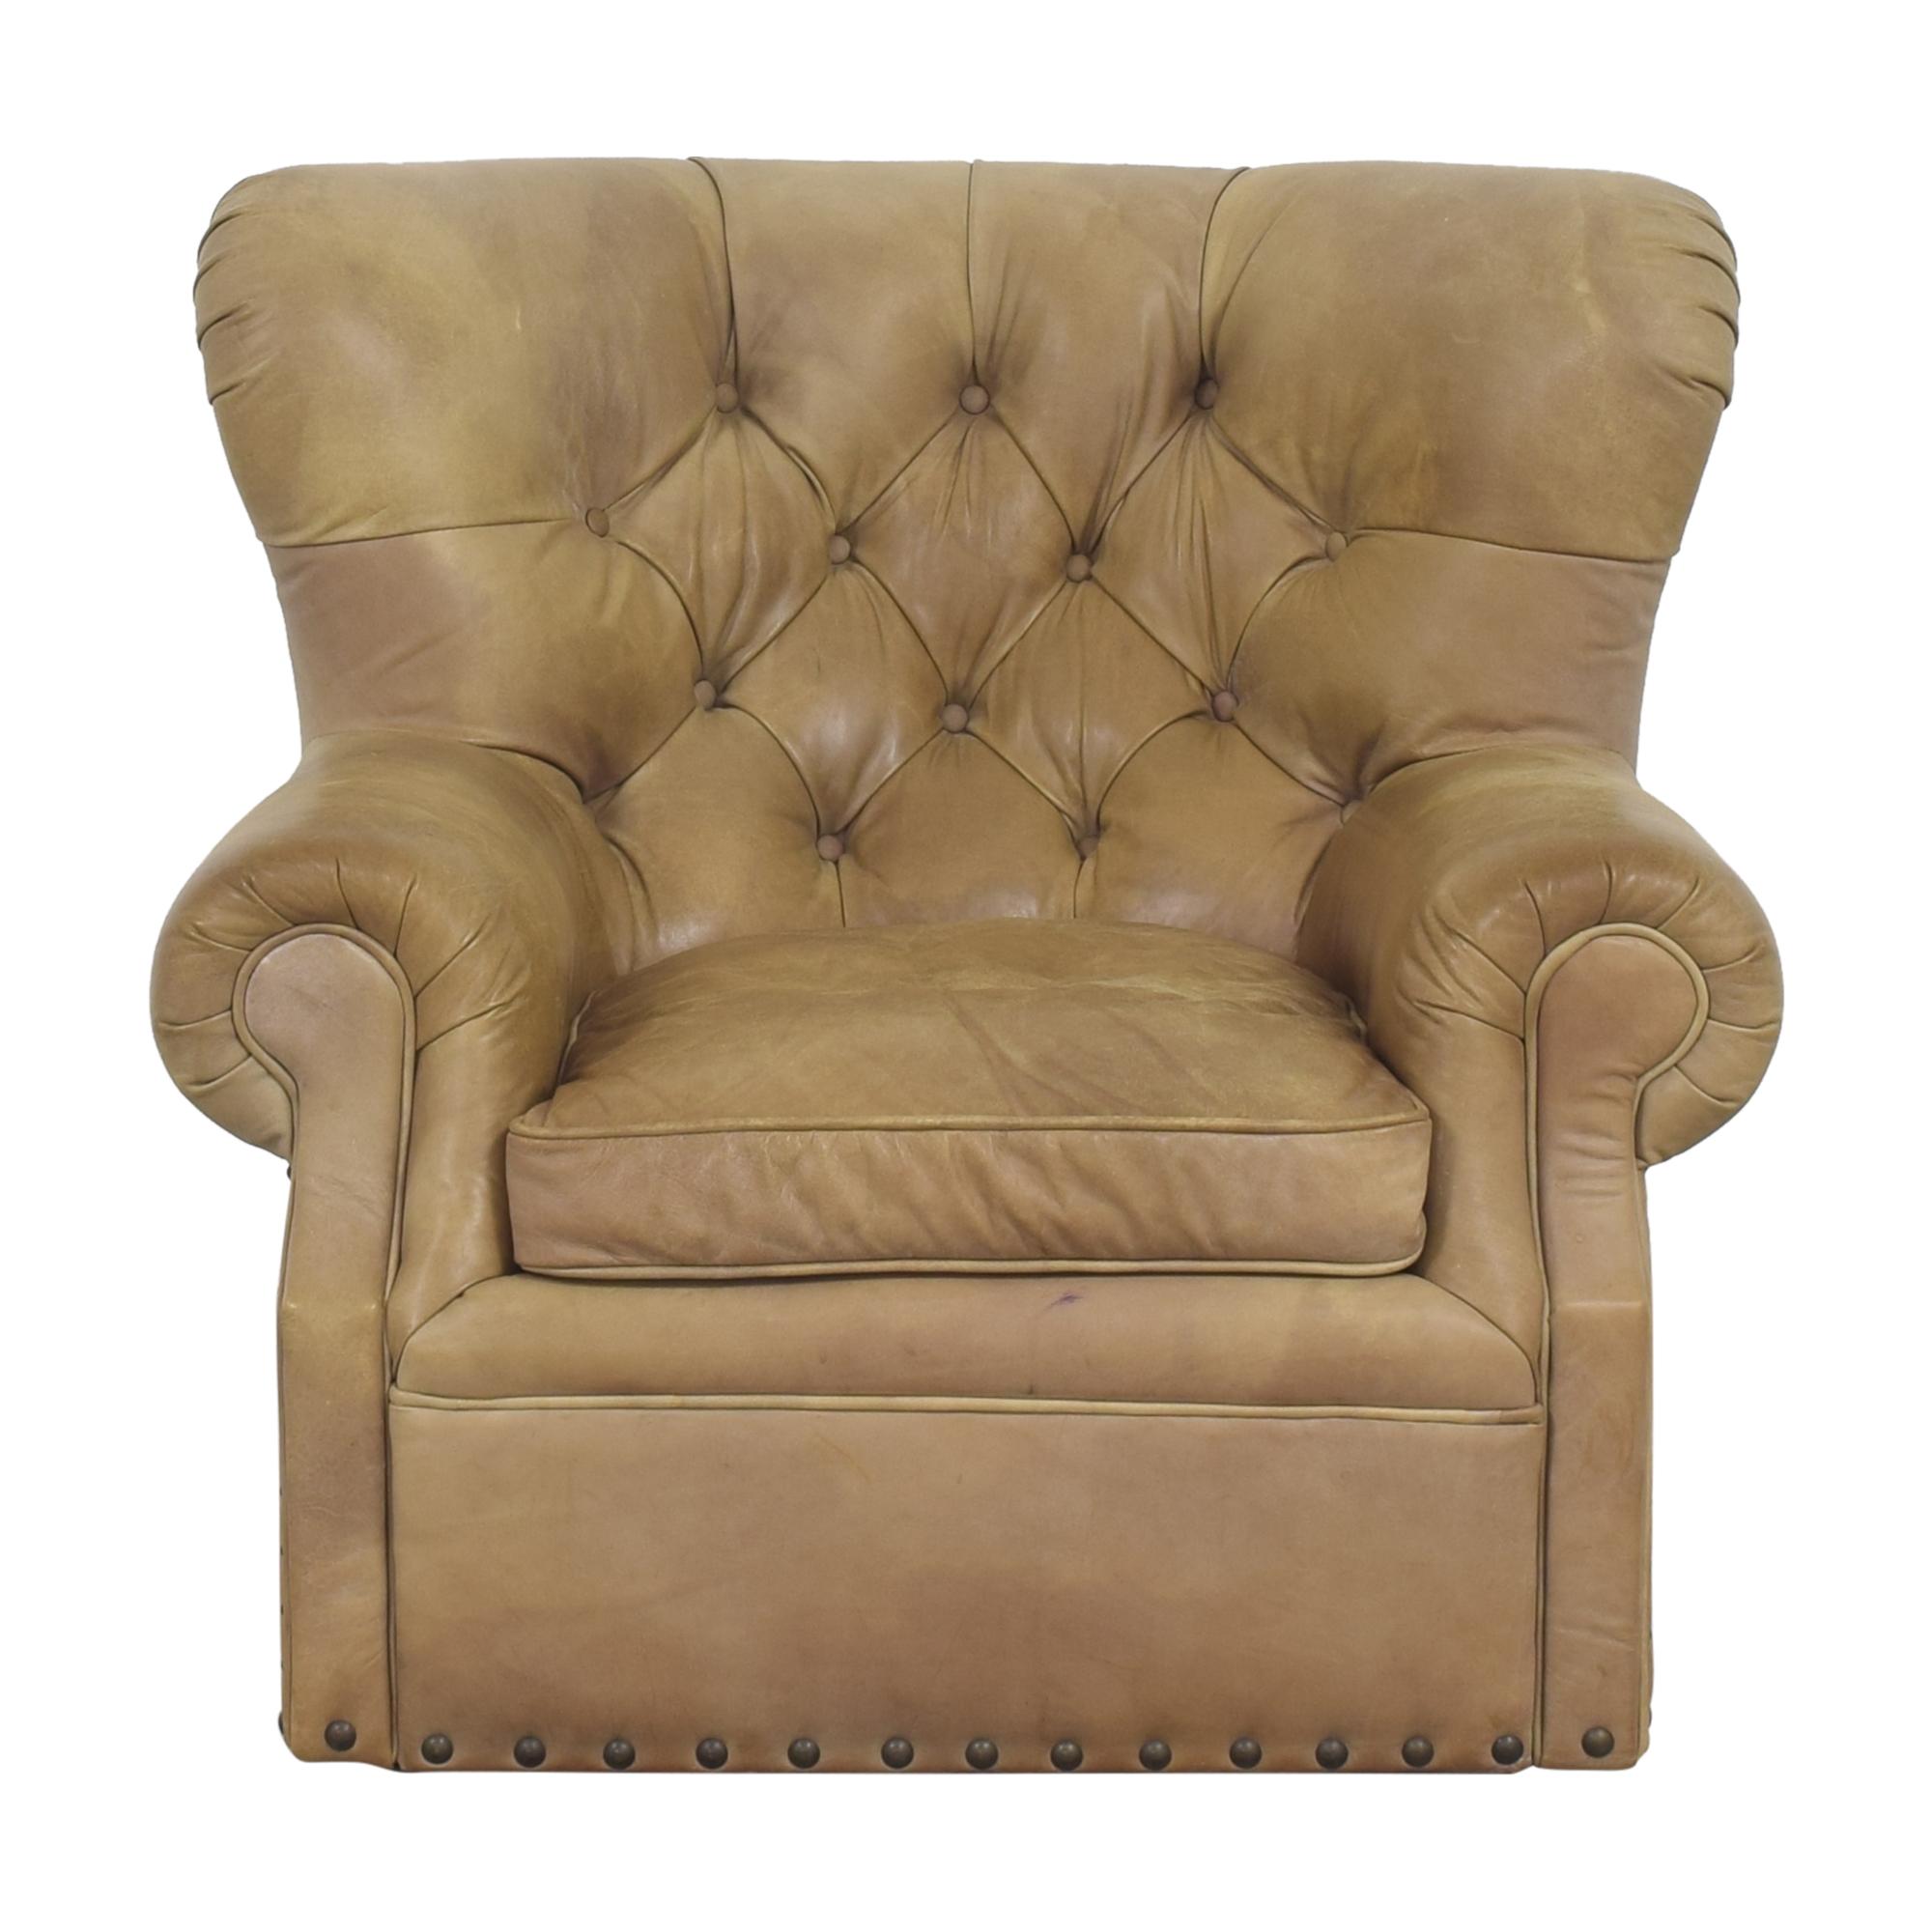 buy Restoration Hardware Churchill Swivel Chair with Nailheads Restoration Hardware Chairs